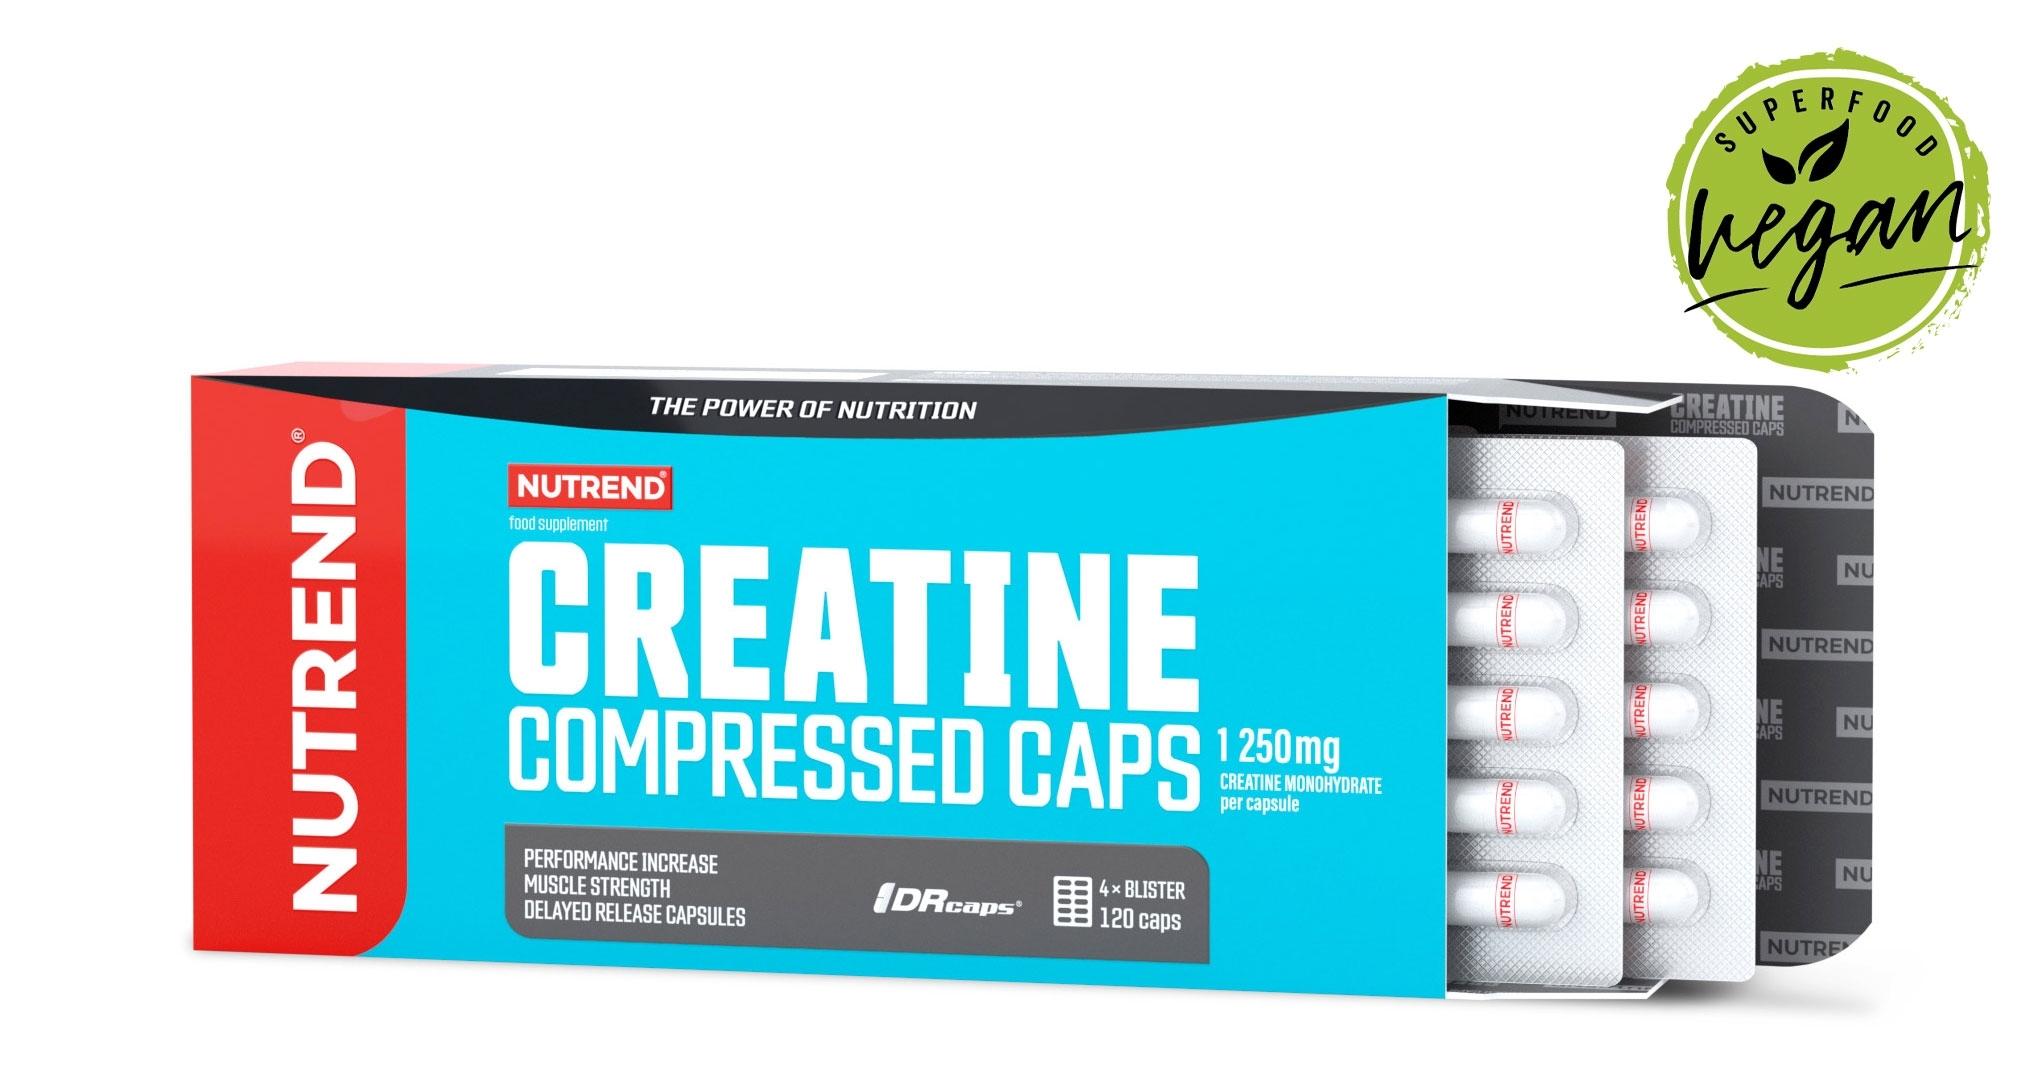 CREATINE COMPRESSED CAPS, obsahuje 120 kapslí